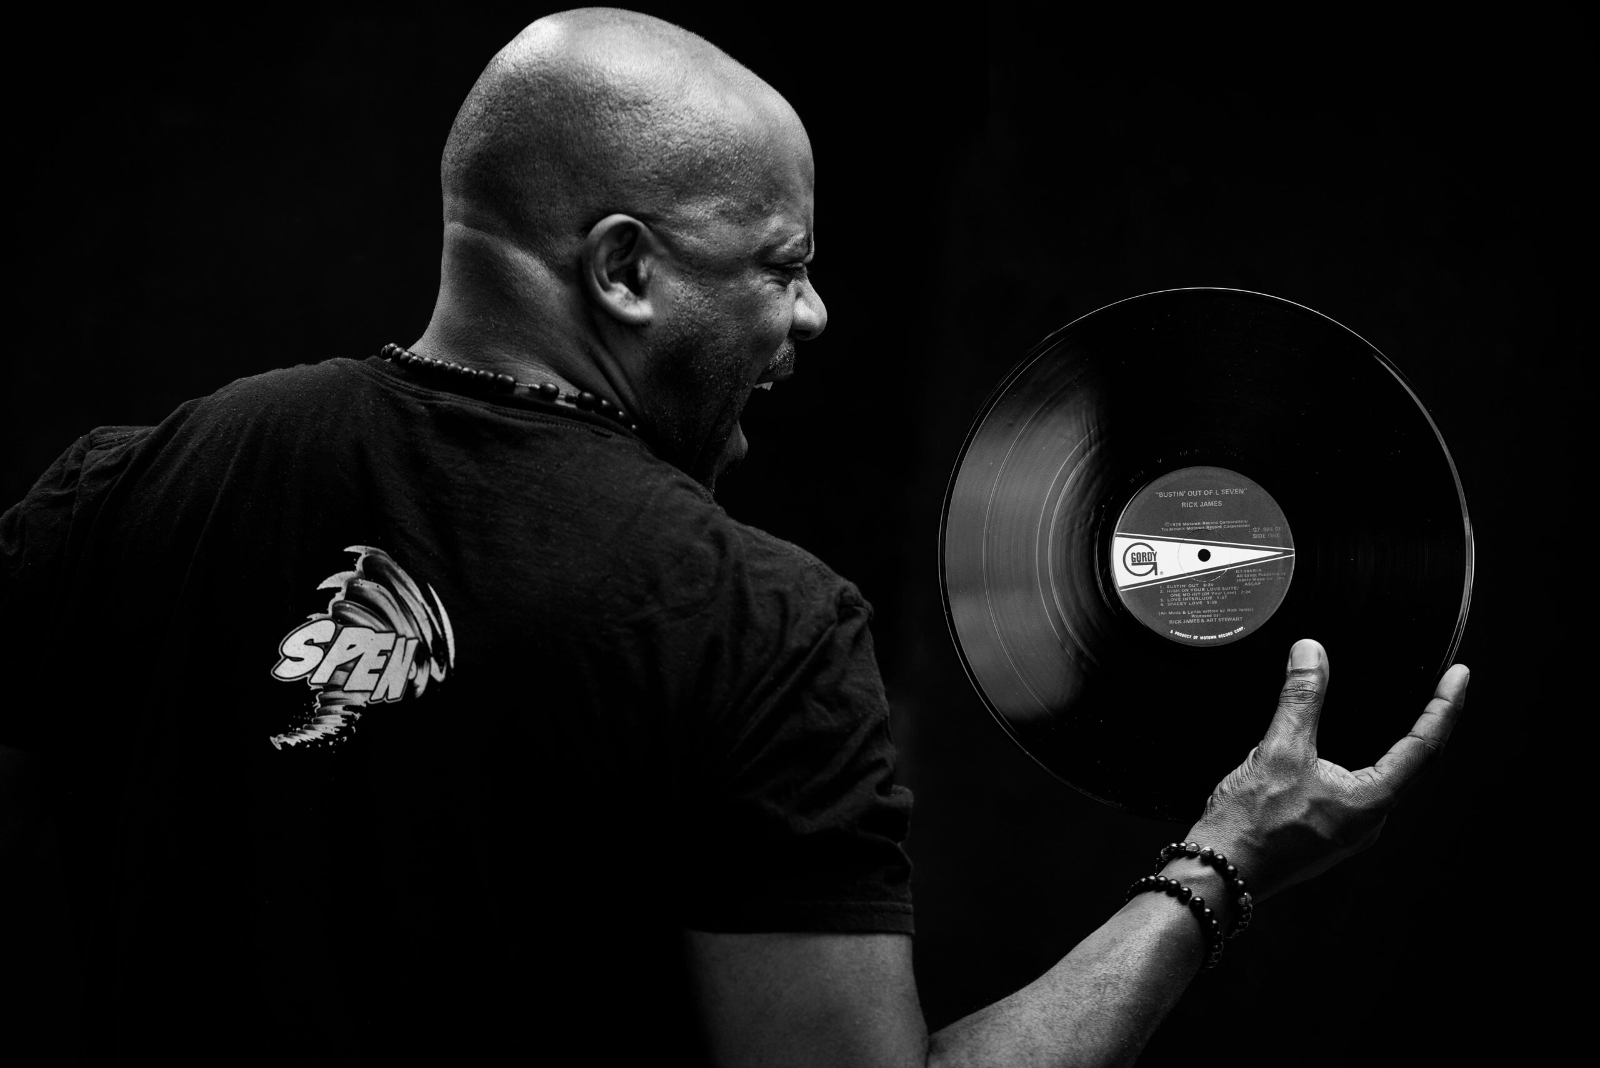 DJ Spen featured in DJ Times' Life in Lockdown series